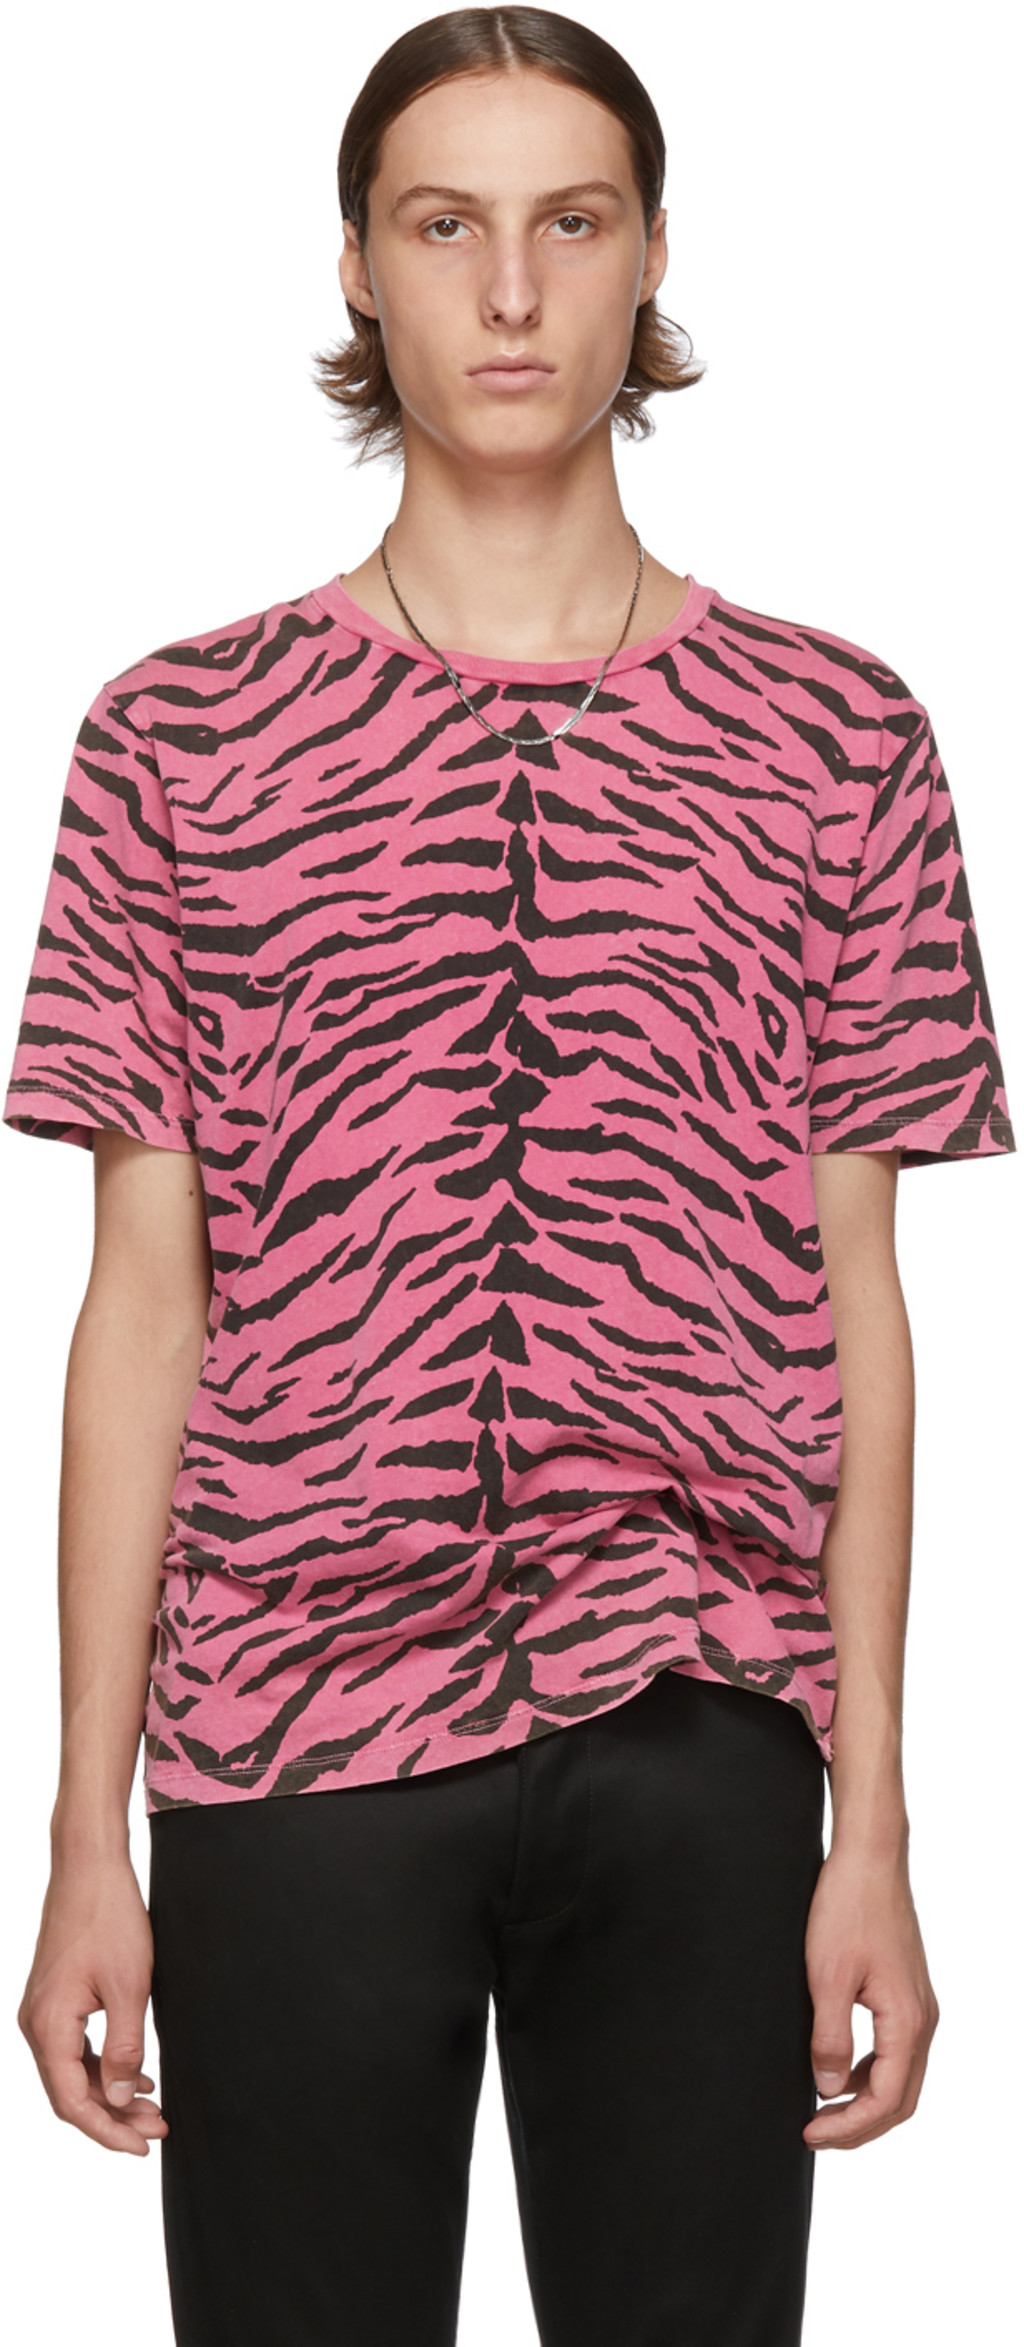 131222a565 Pink & Black Used-Look Zebra T-Shirt